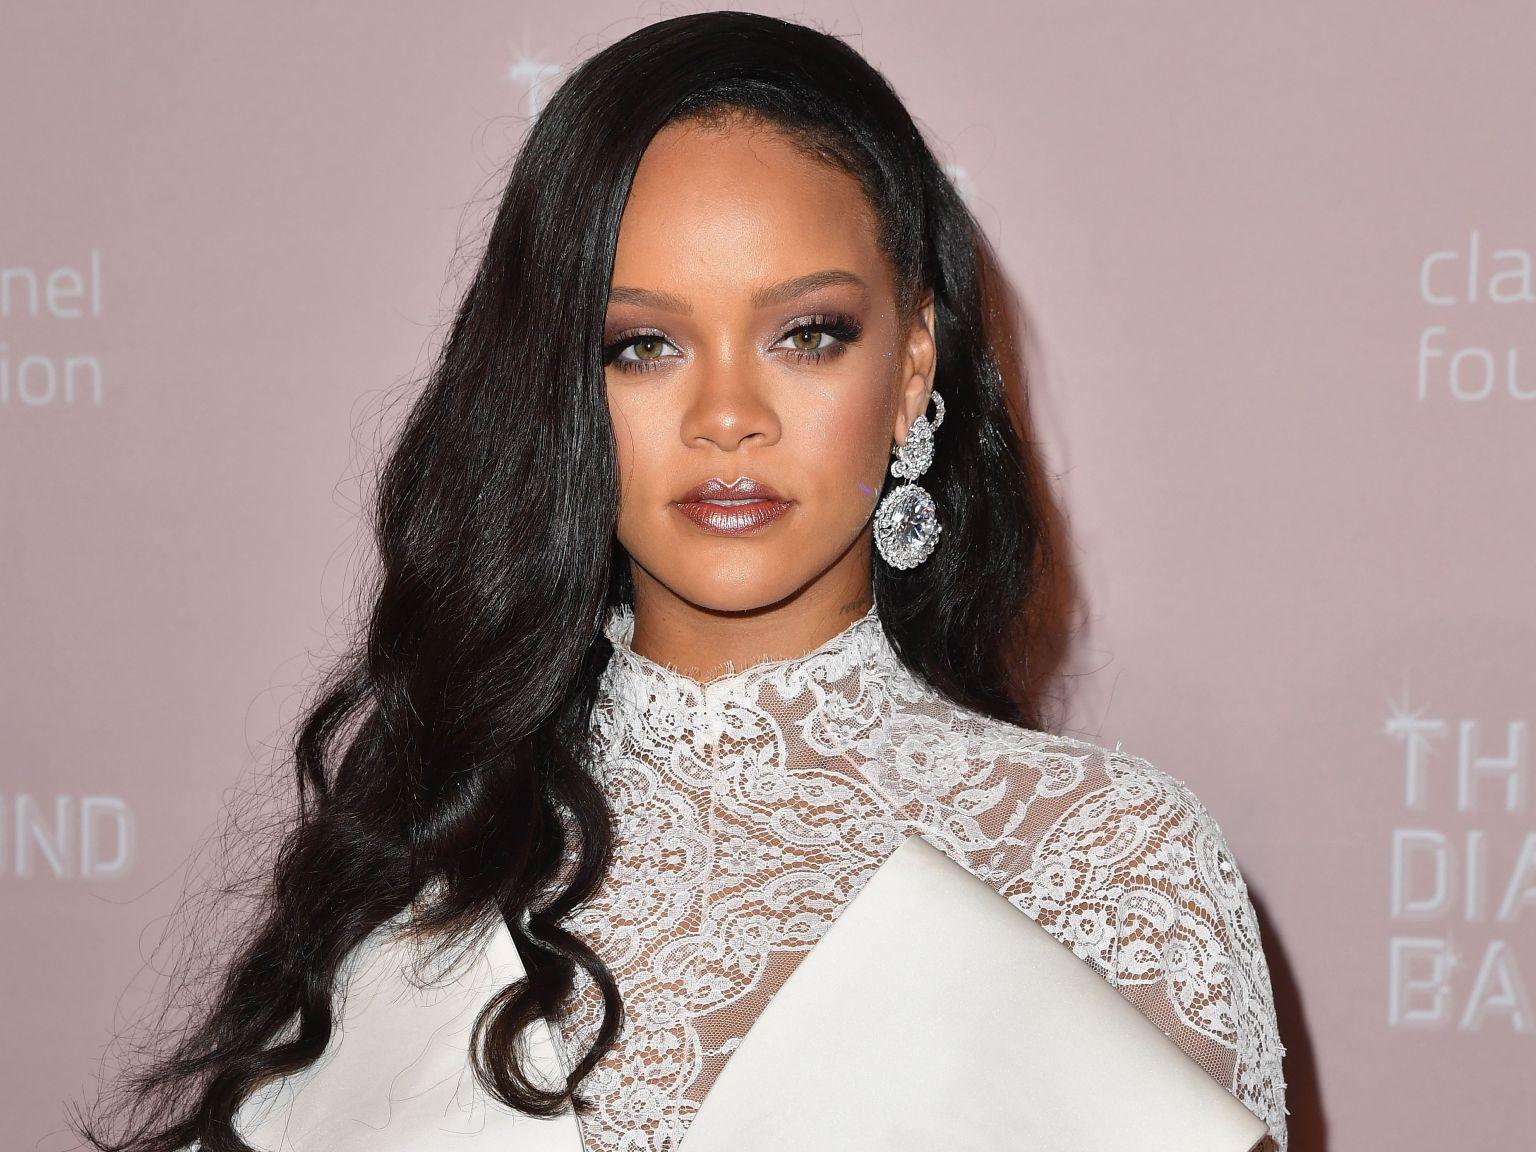 Rihanna Sent Father a Ventilator While He Was Battling Coronavirus